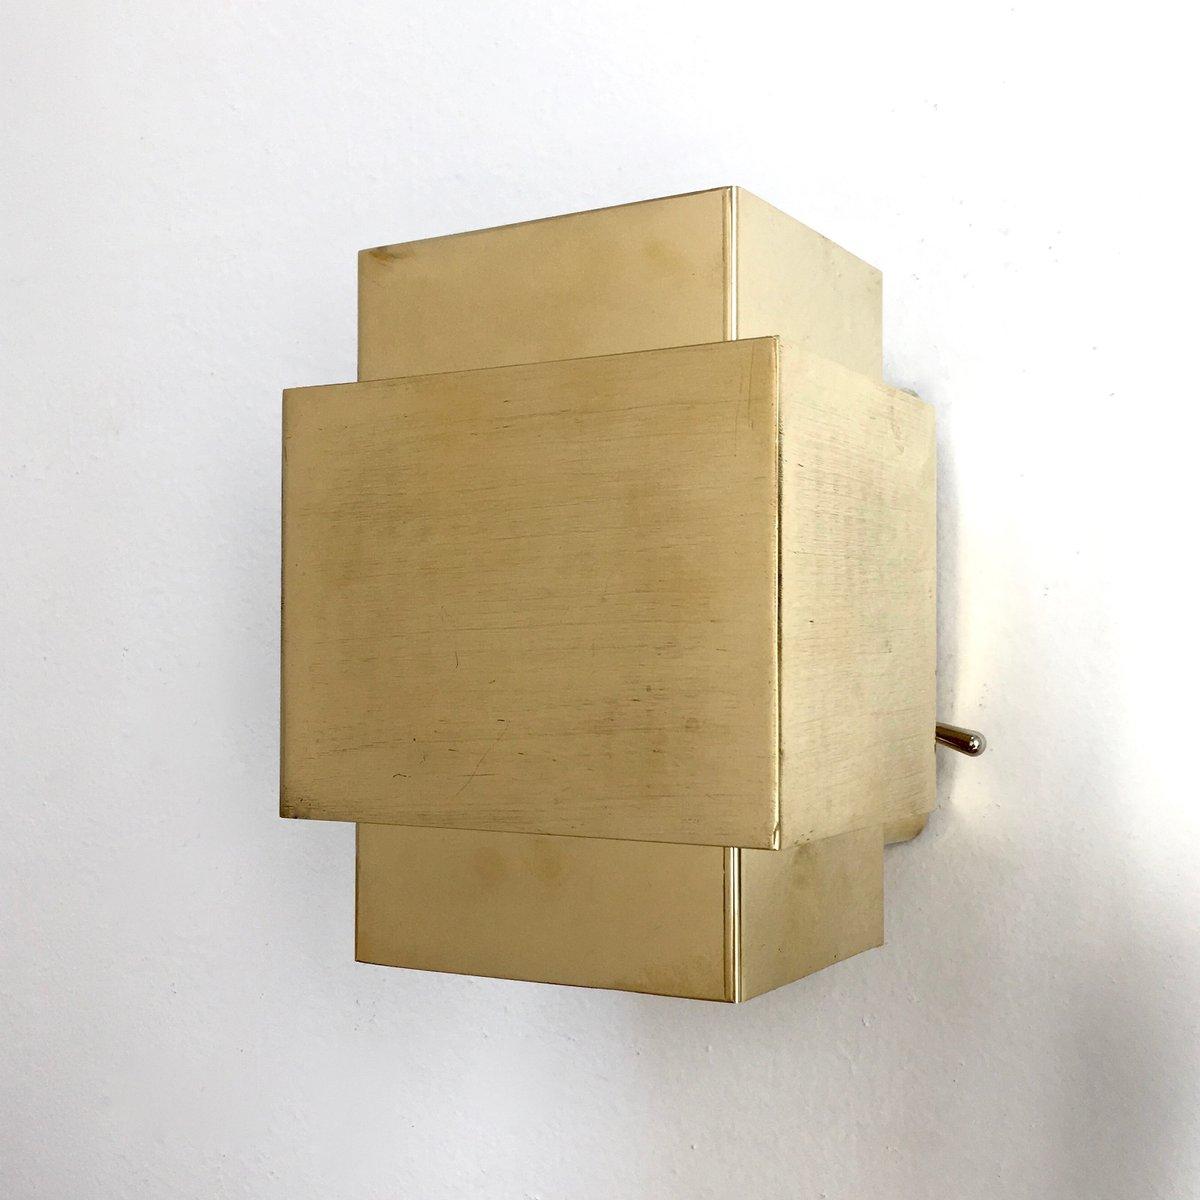 Würfelförmige Wandlampe aus Messing, 1960er